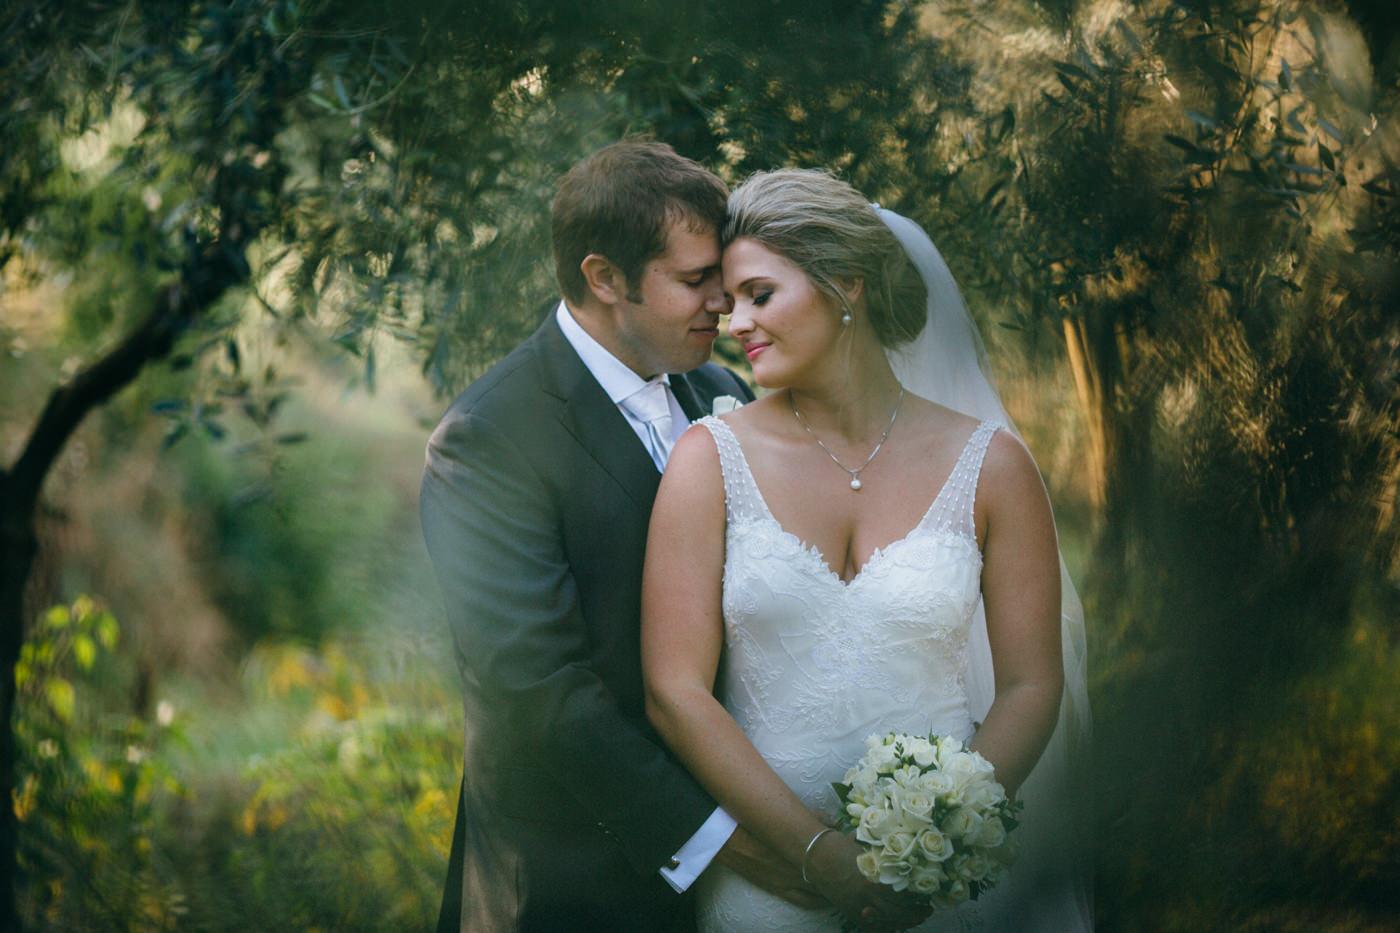 bracu_wedding_photos1066.jpg